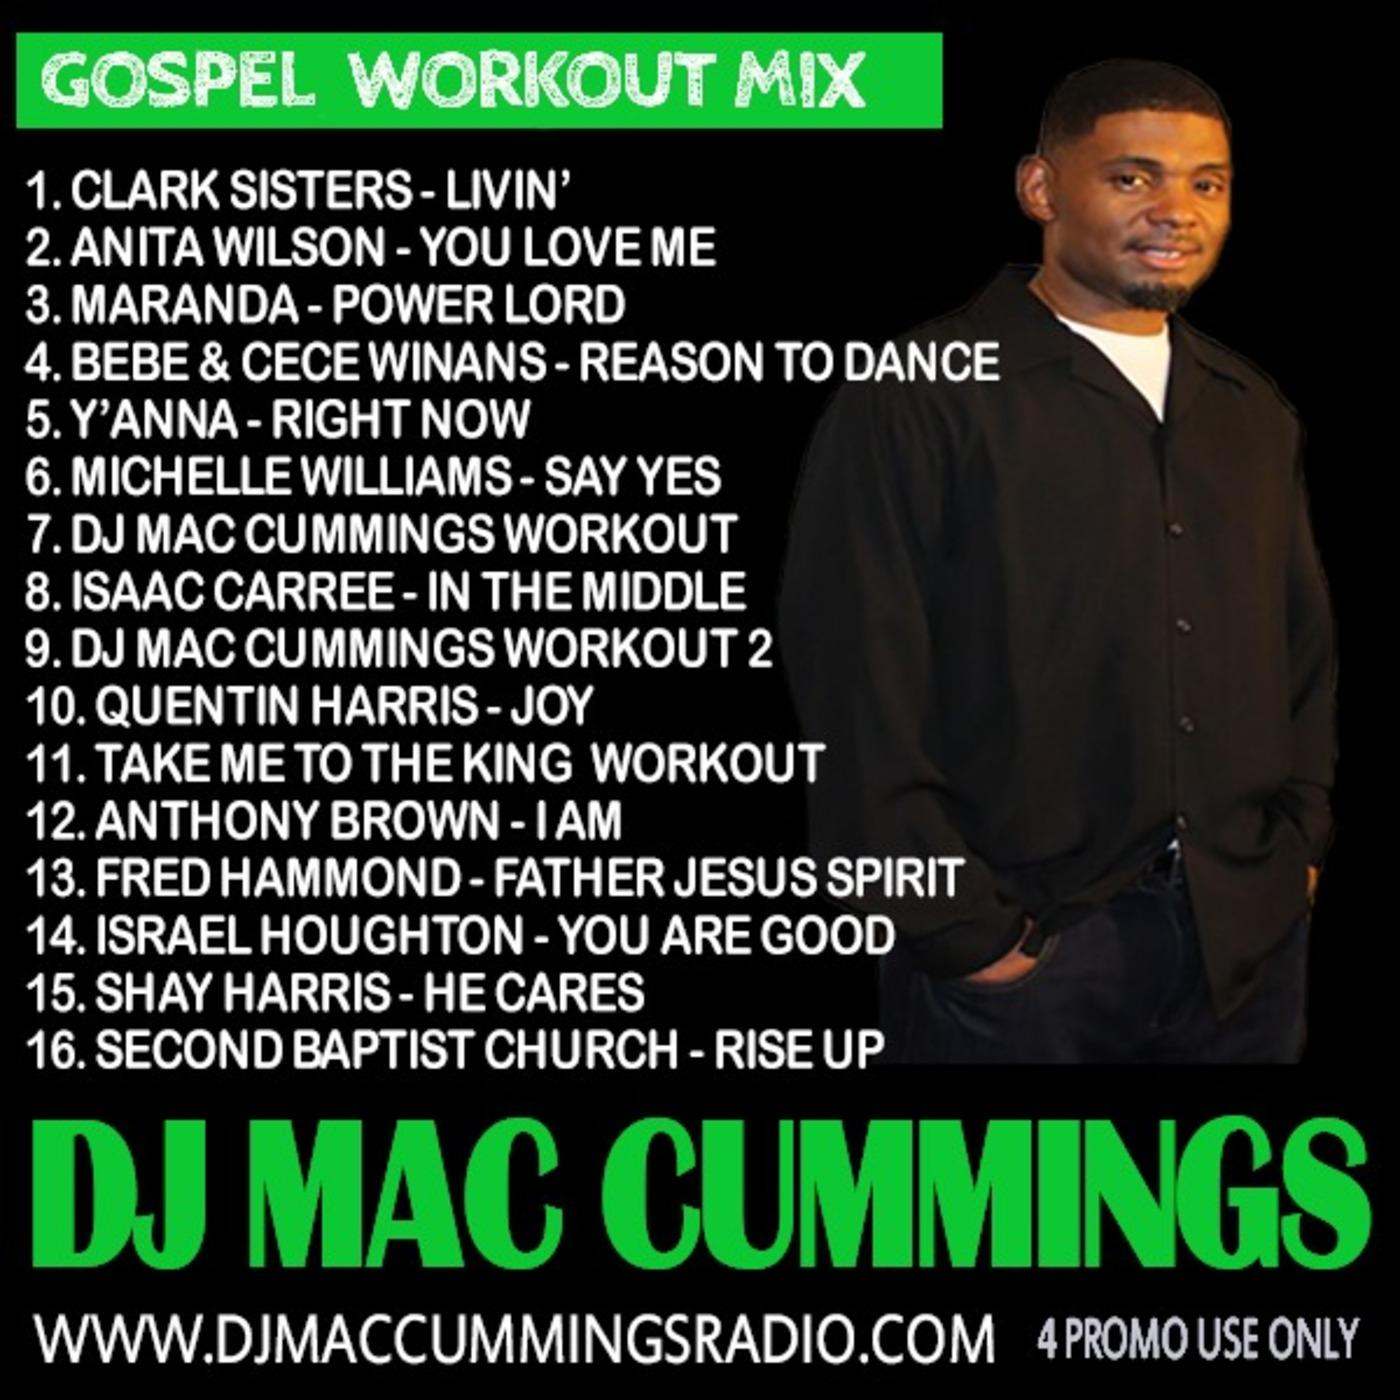 DJ MAC CUMMINGS GOSPEL WORKOUT MIX DJ Mac Cummings